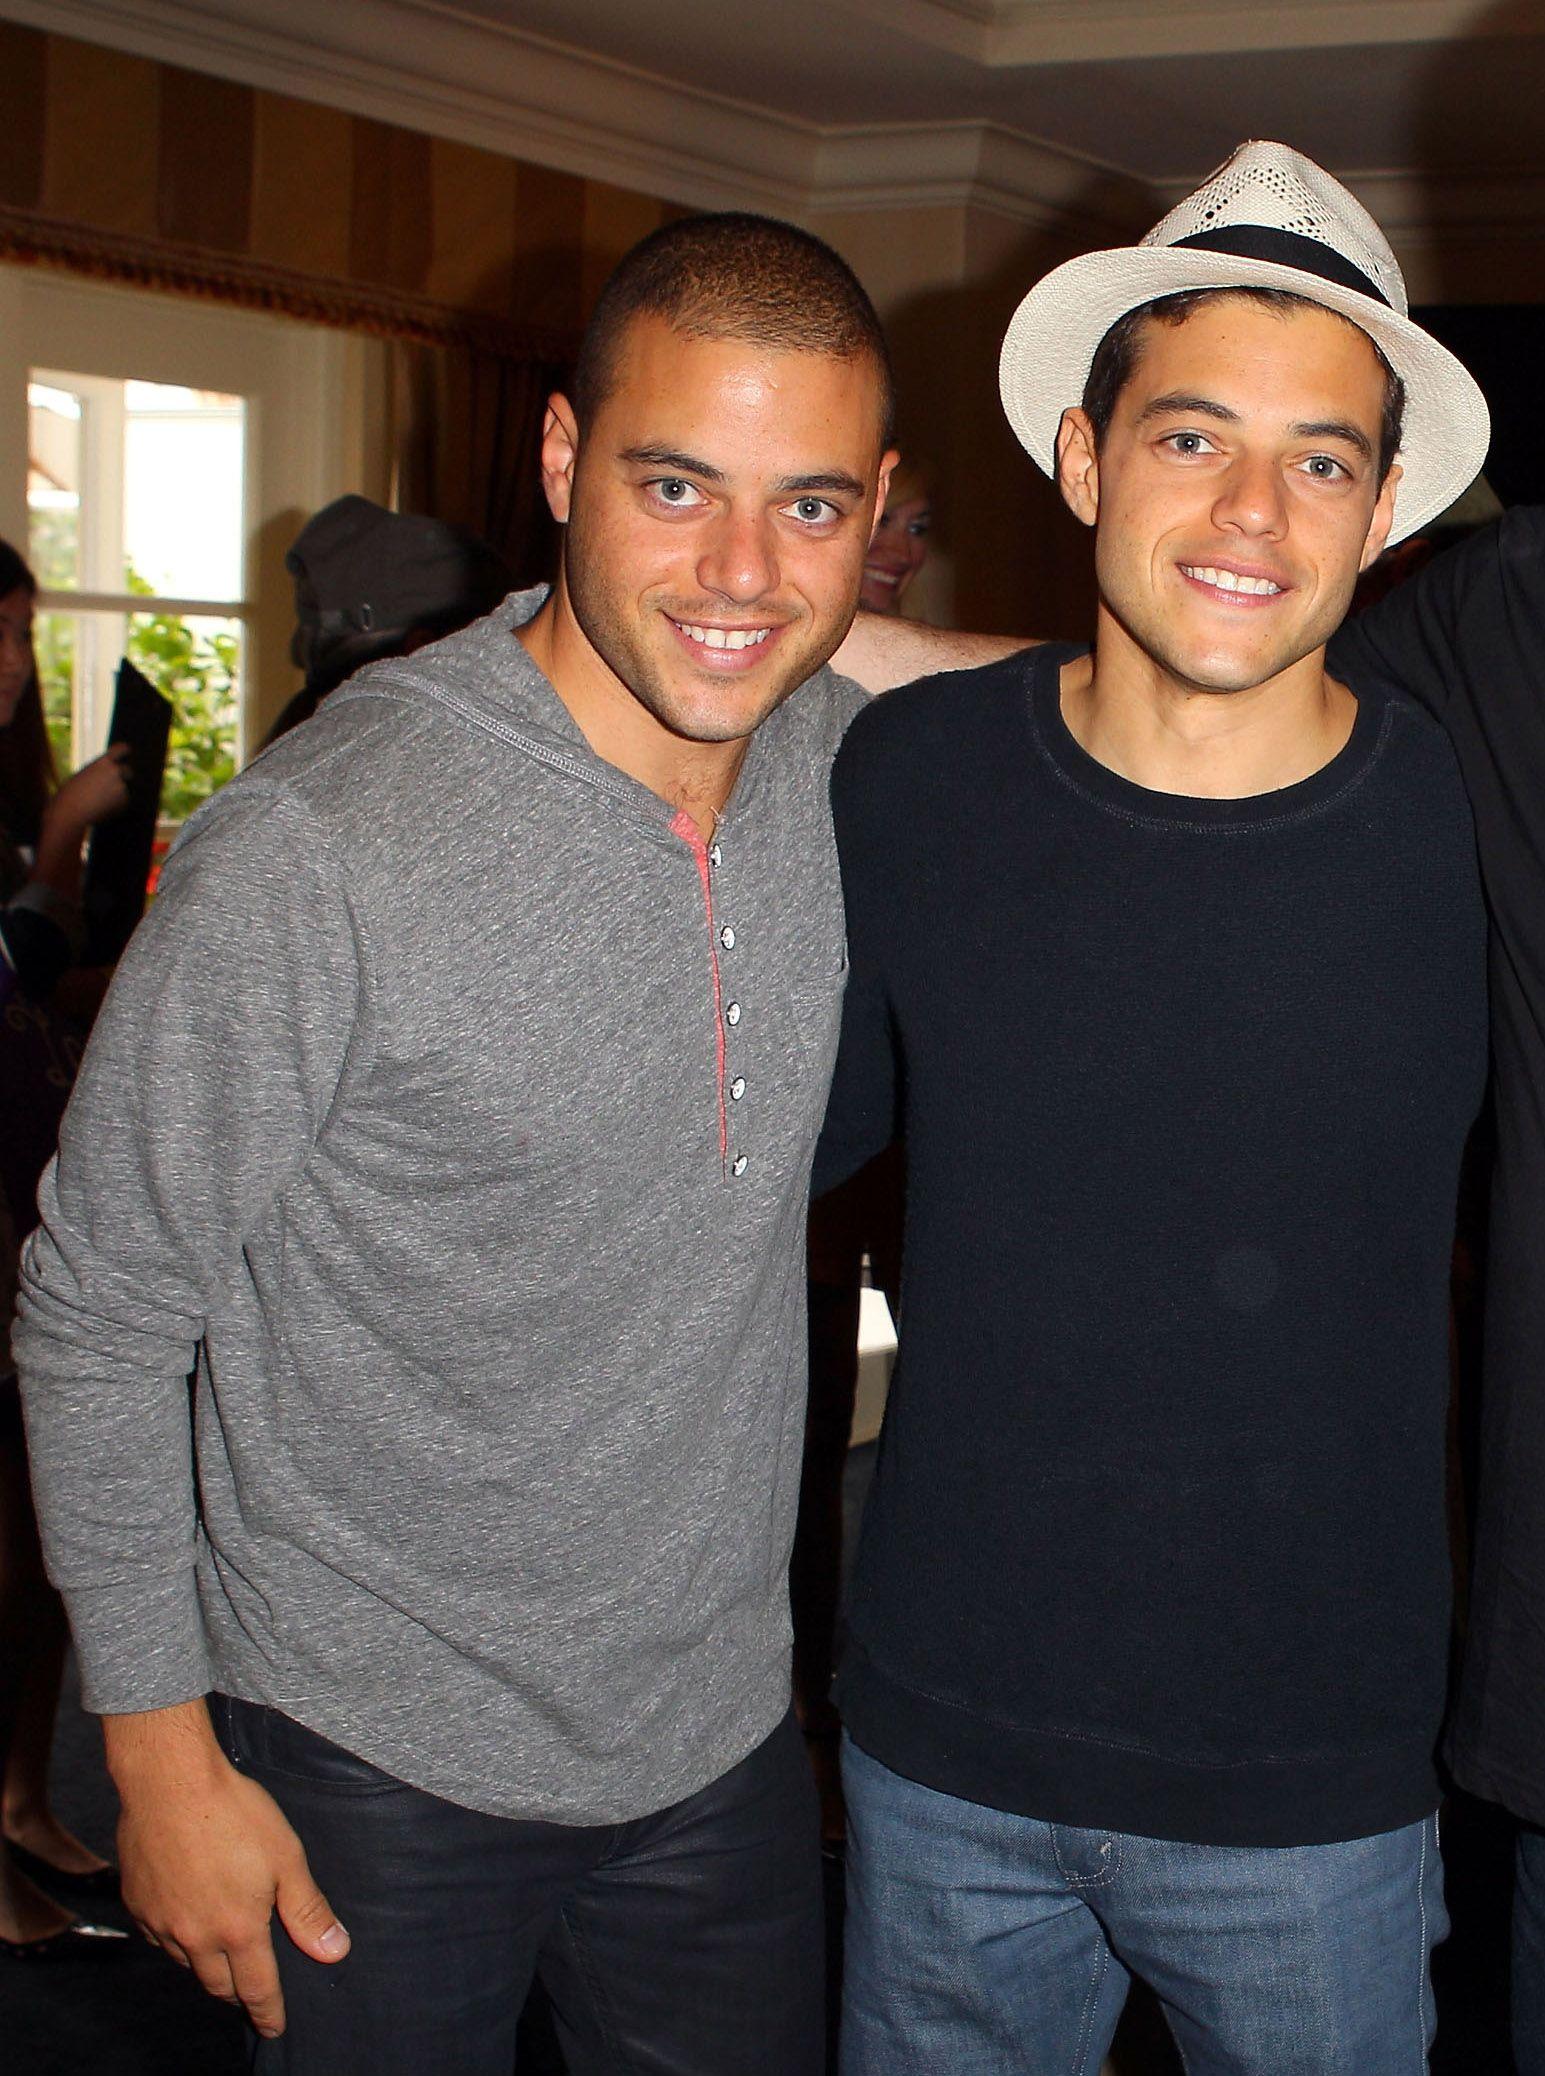 Twins australian gay